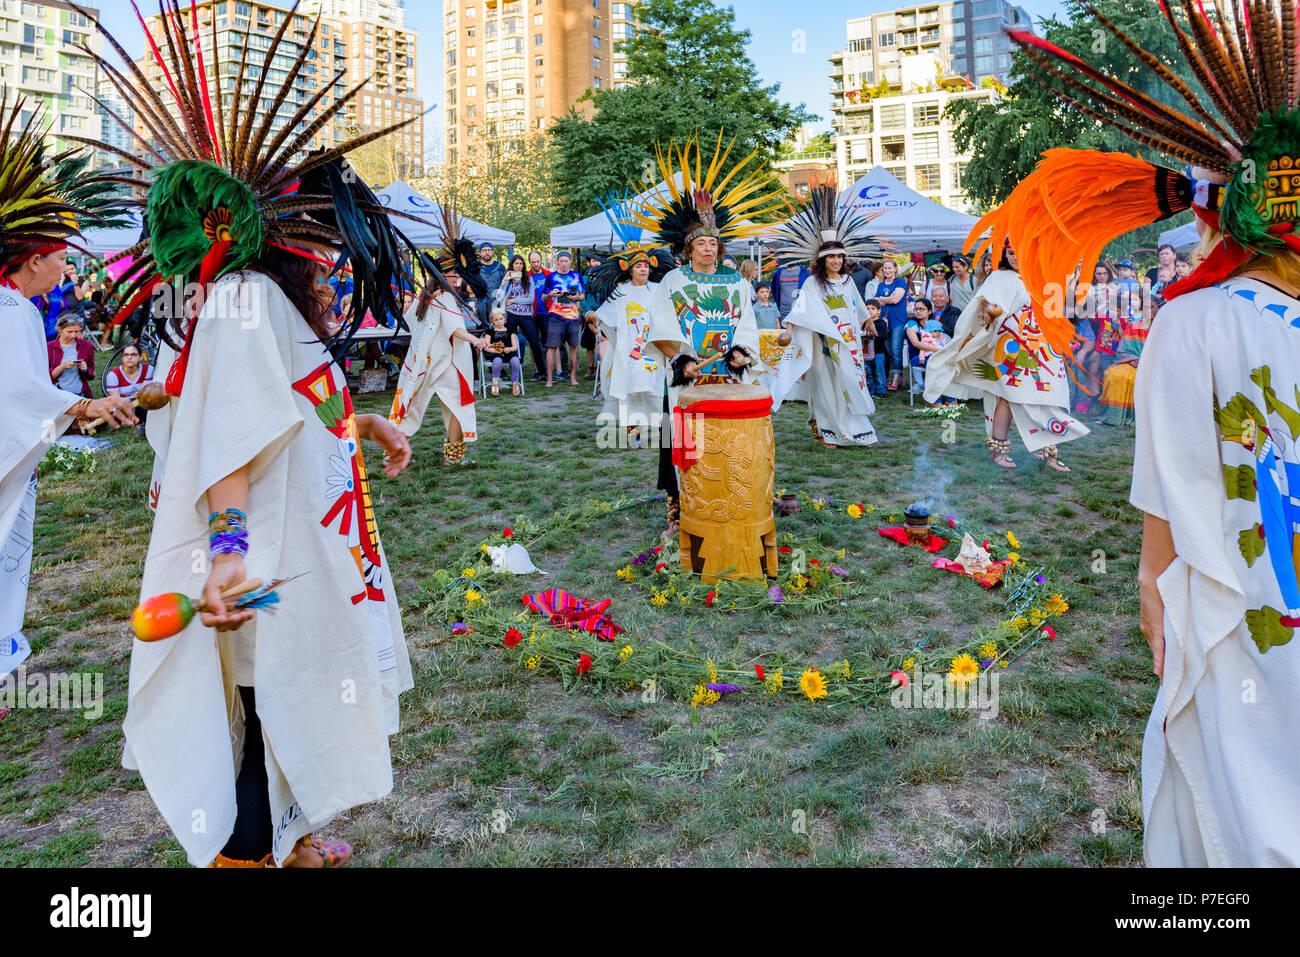 Aztec Dance Group, Gathering Festival, Summer Solstice Celebration, Vancouver, Emery Barnes Park, British Columbia, Canada. - Stock Image